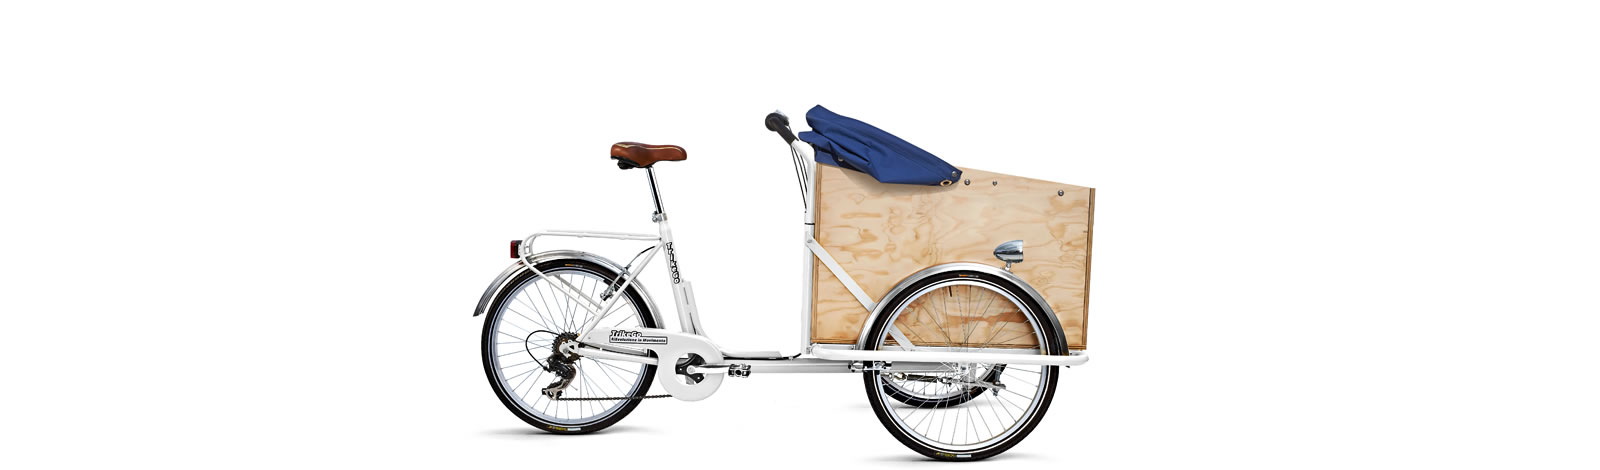 TrikeGo Cargobike- cassone - capottina abbassata - bianco